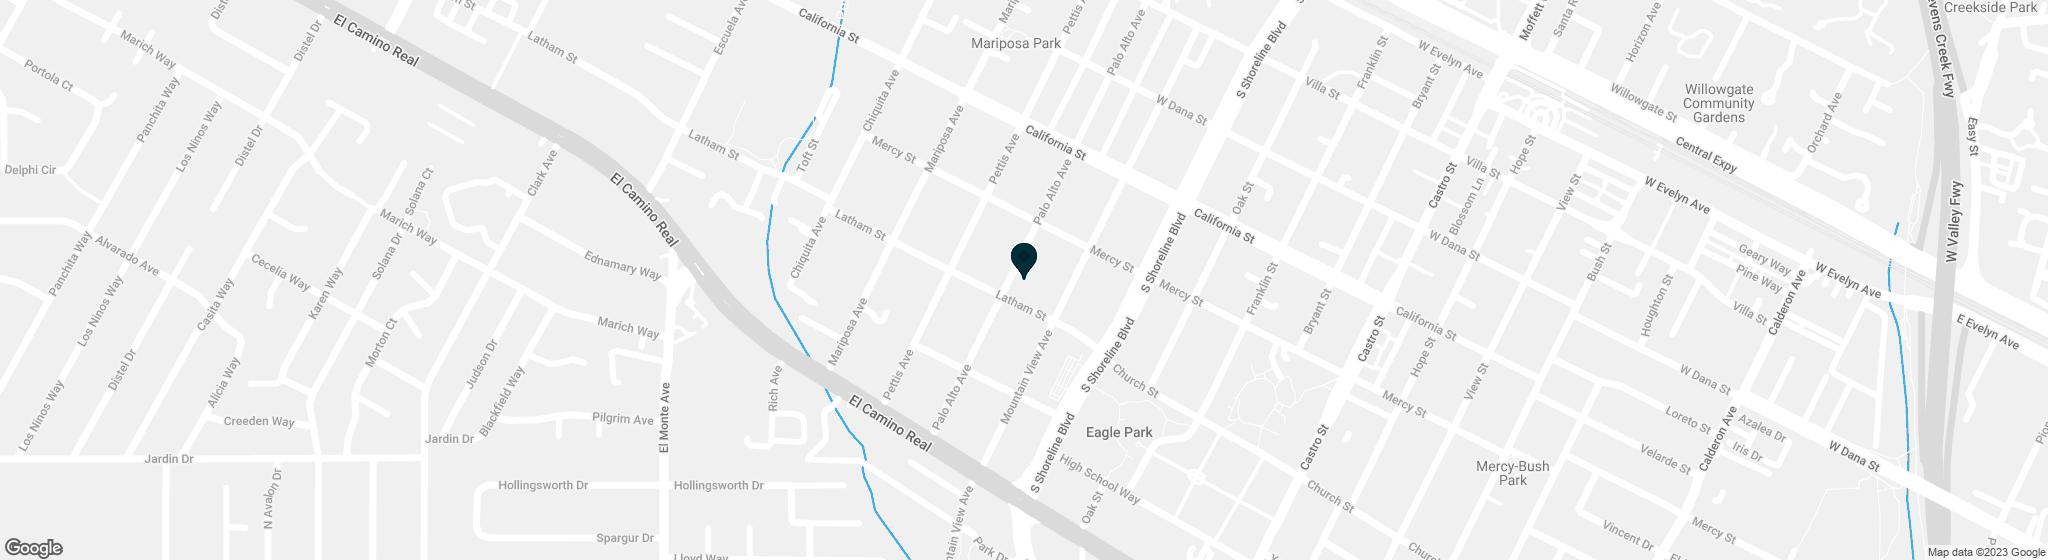 573 Palo Alto Mountain View CA 94041